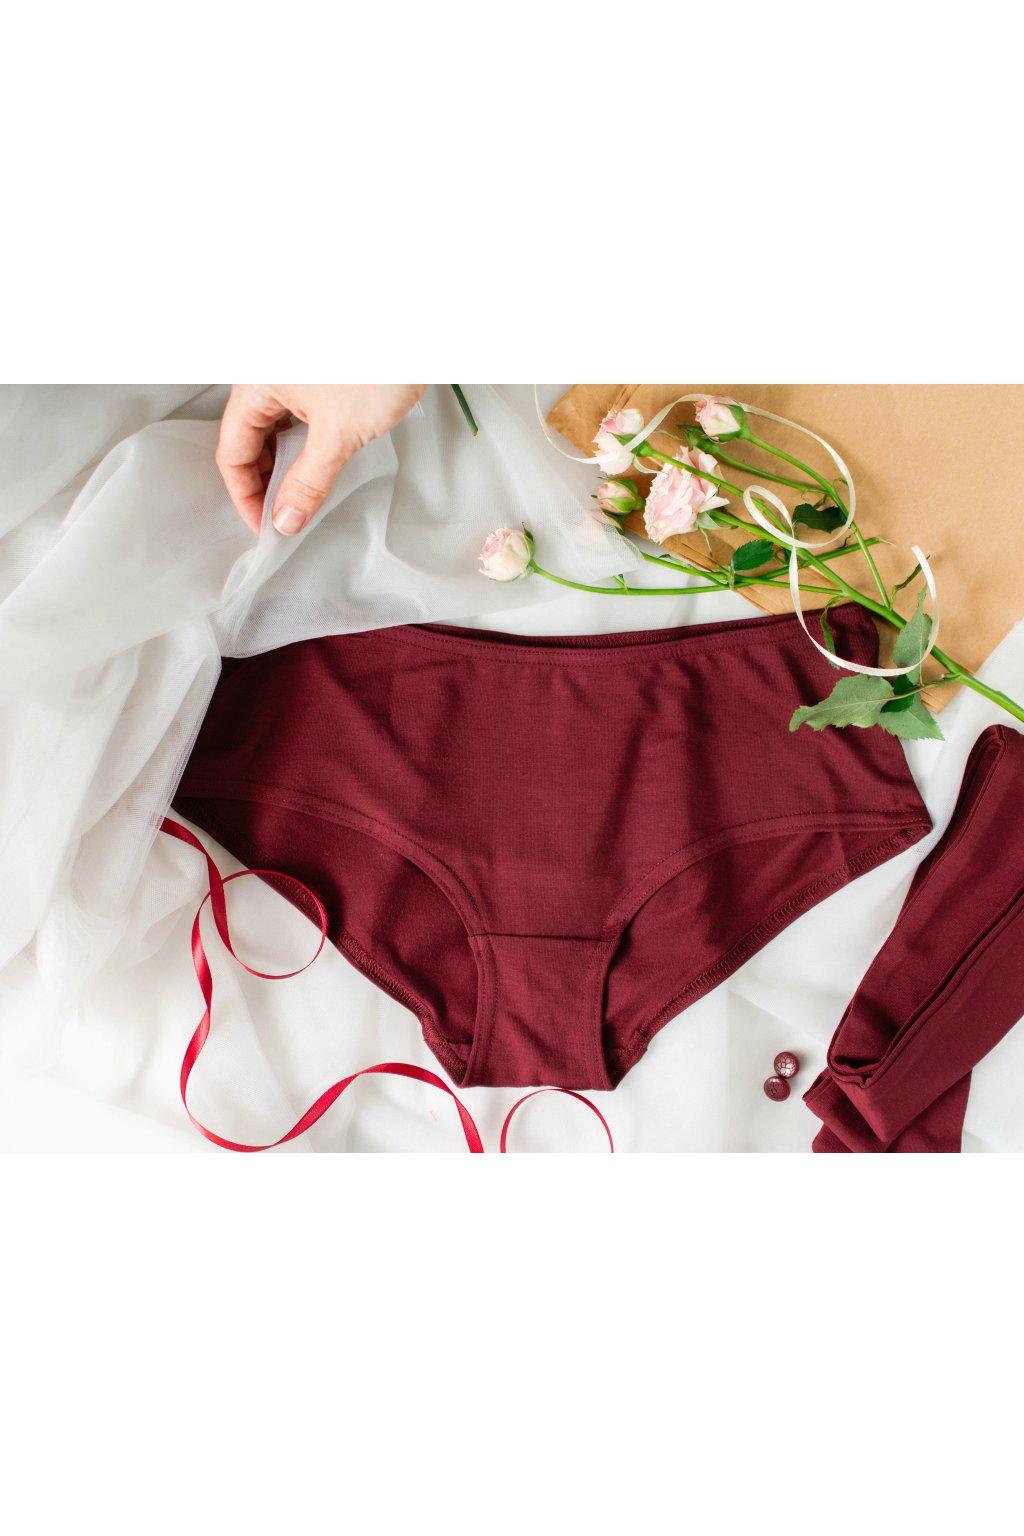 Reparada kalhotky, pasy big 022